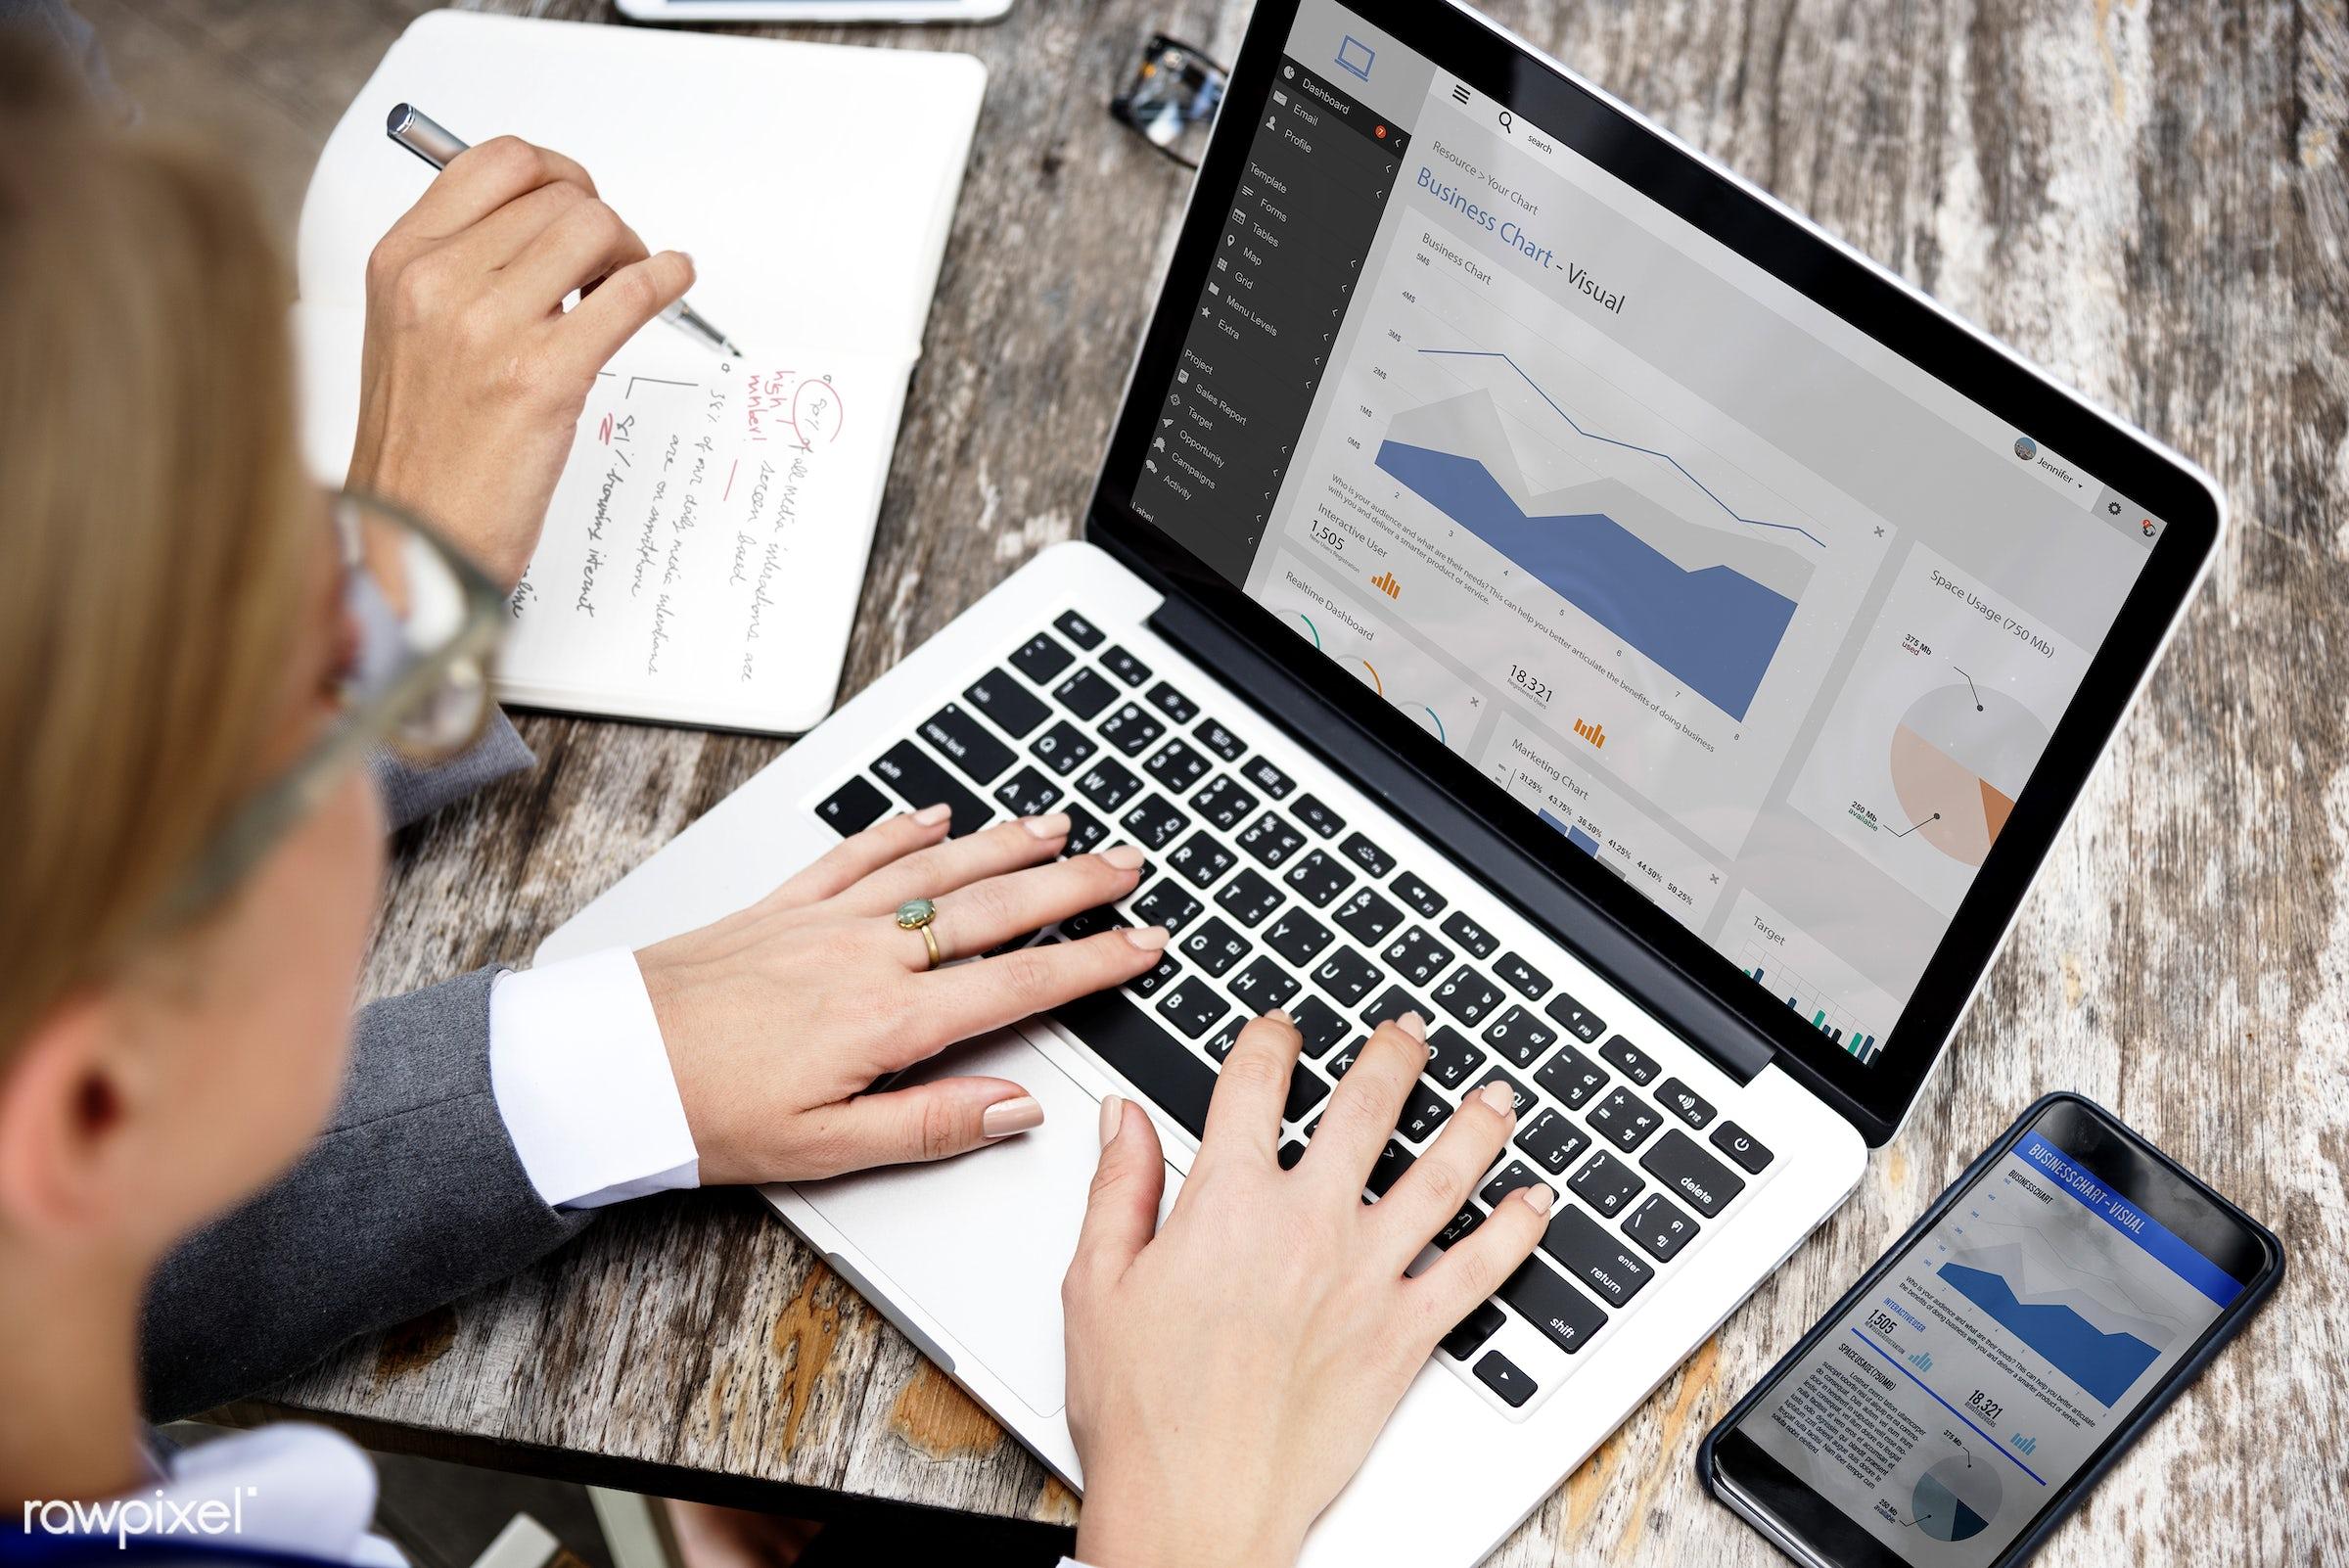 analysis, analytics, analyze, business, businesswoman, businesswomen, data, data analysis, devices, digital, digital device...